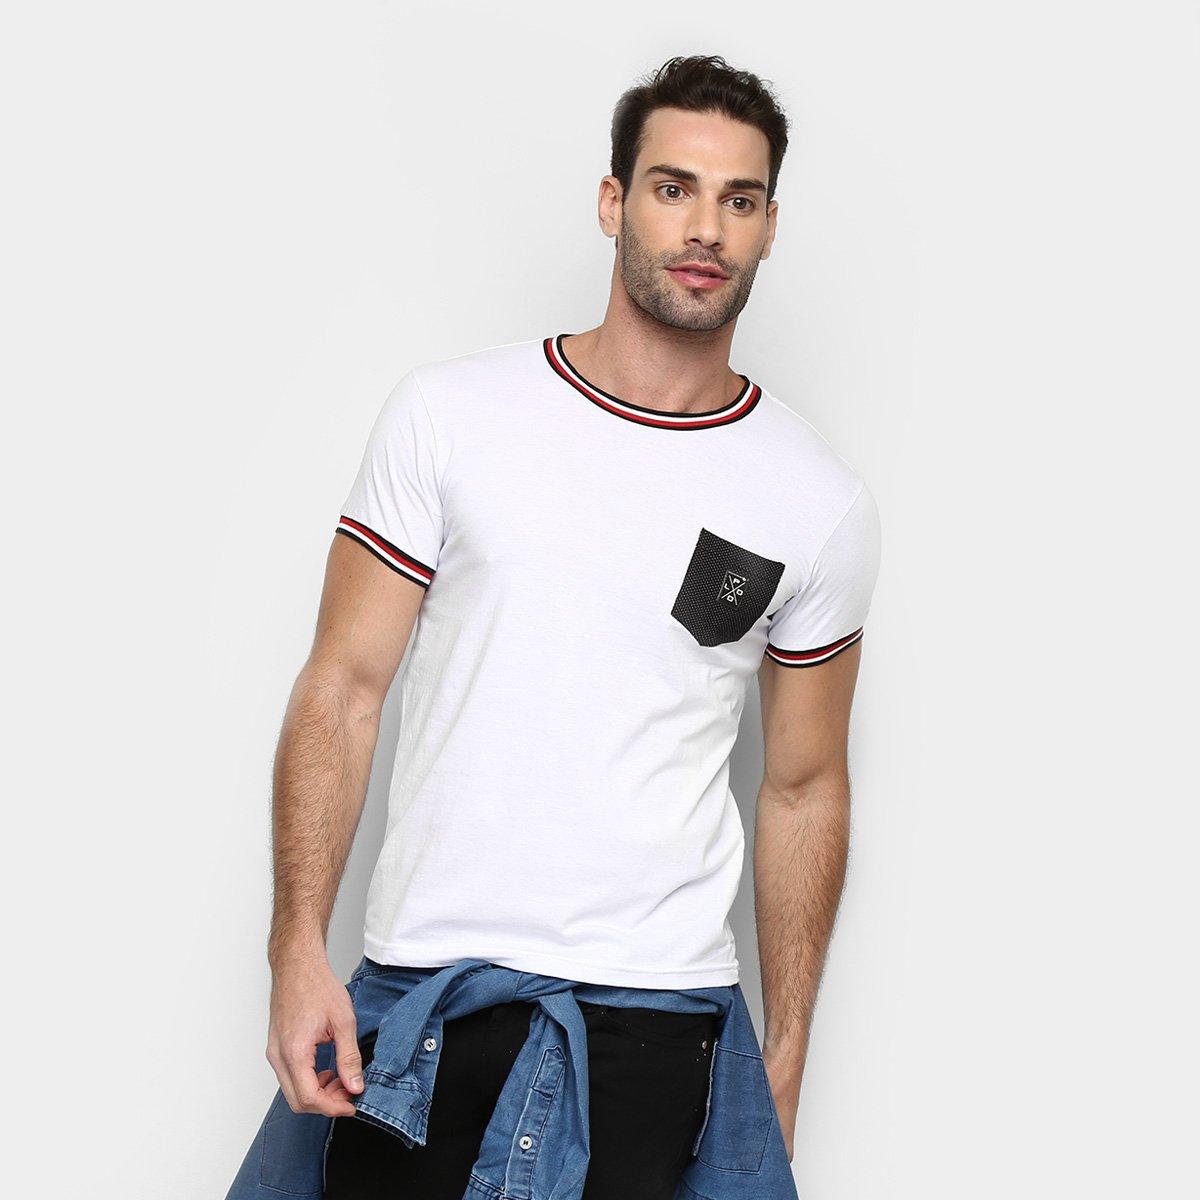 Camiseta RG 518 Gola Listrada Masculina 8d1156c901f62